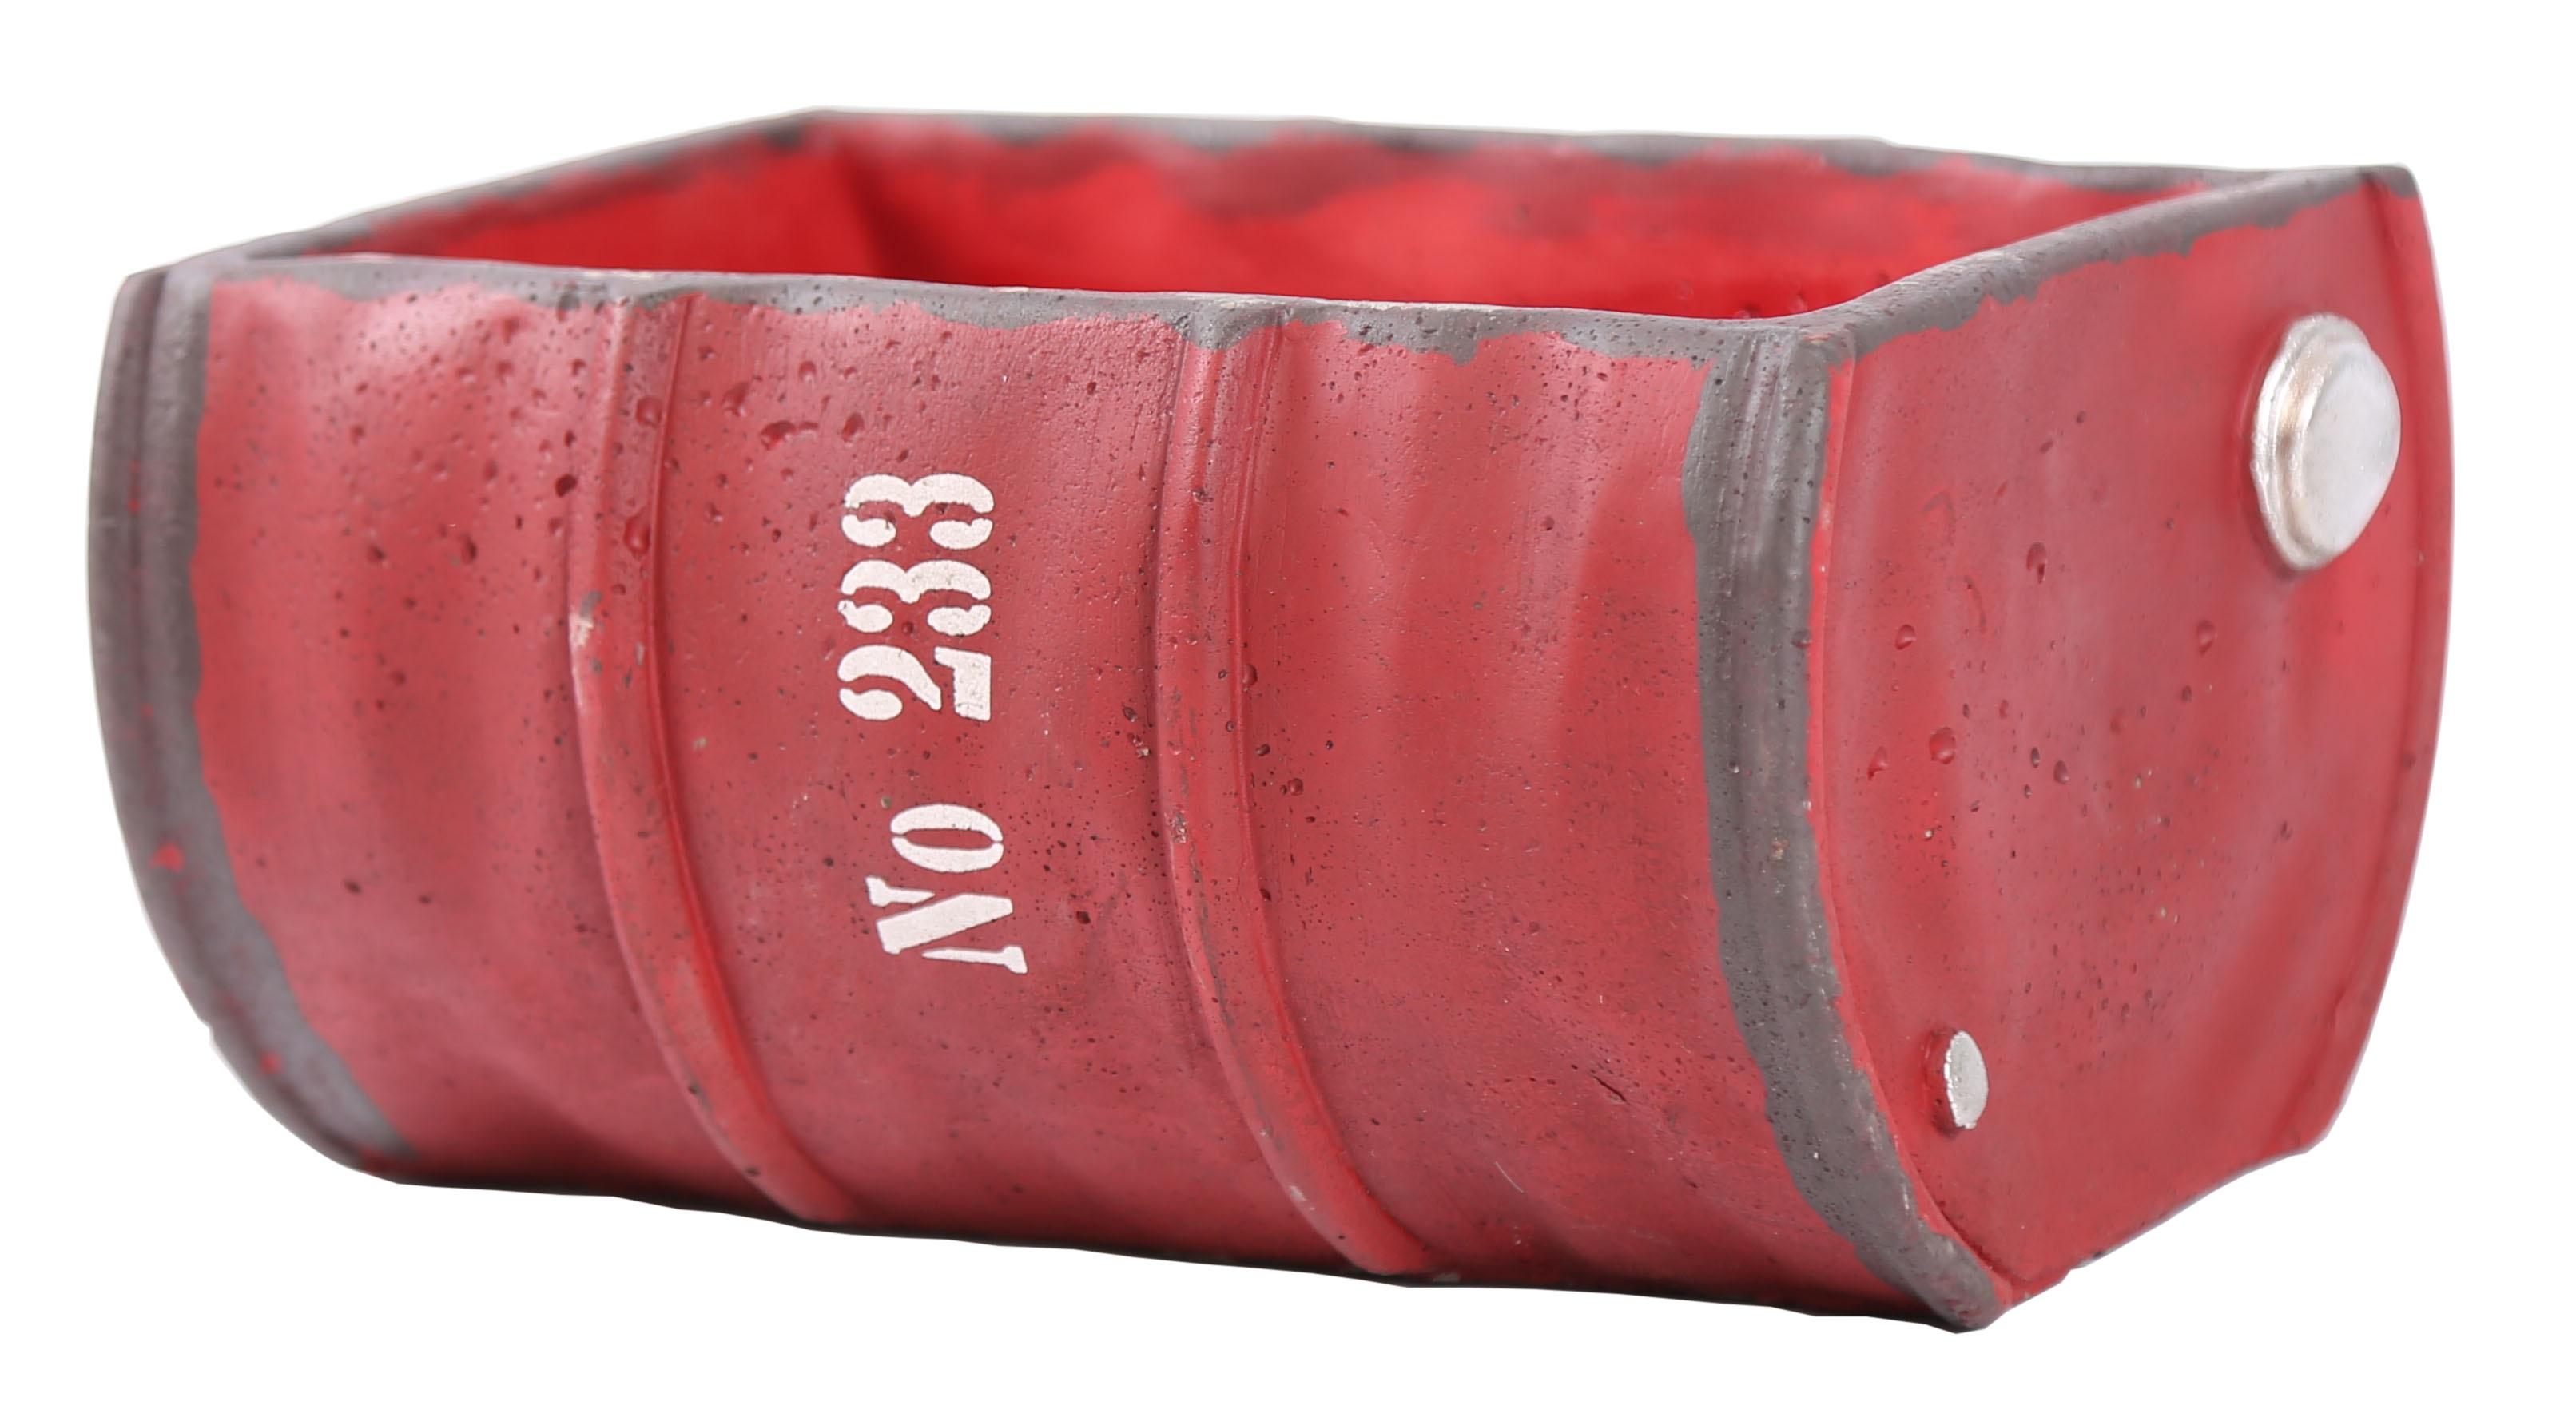 Blumentopf rund shabby chic beton bertopf rostoptik for Blumentopf beton